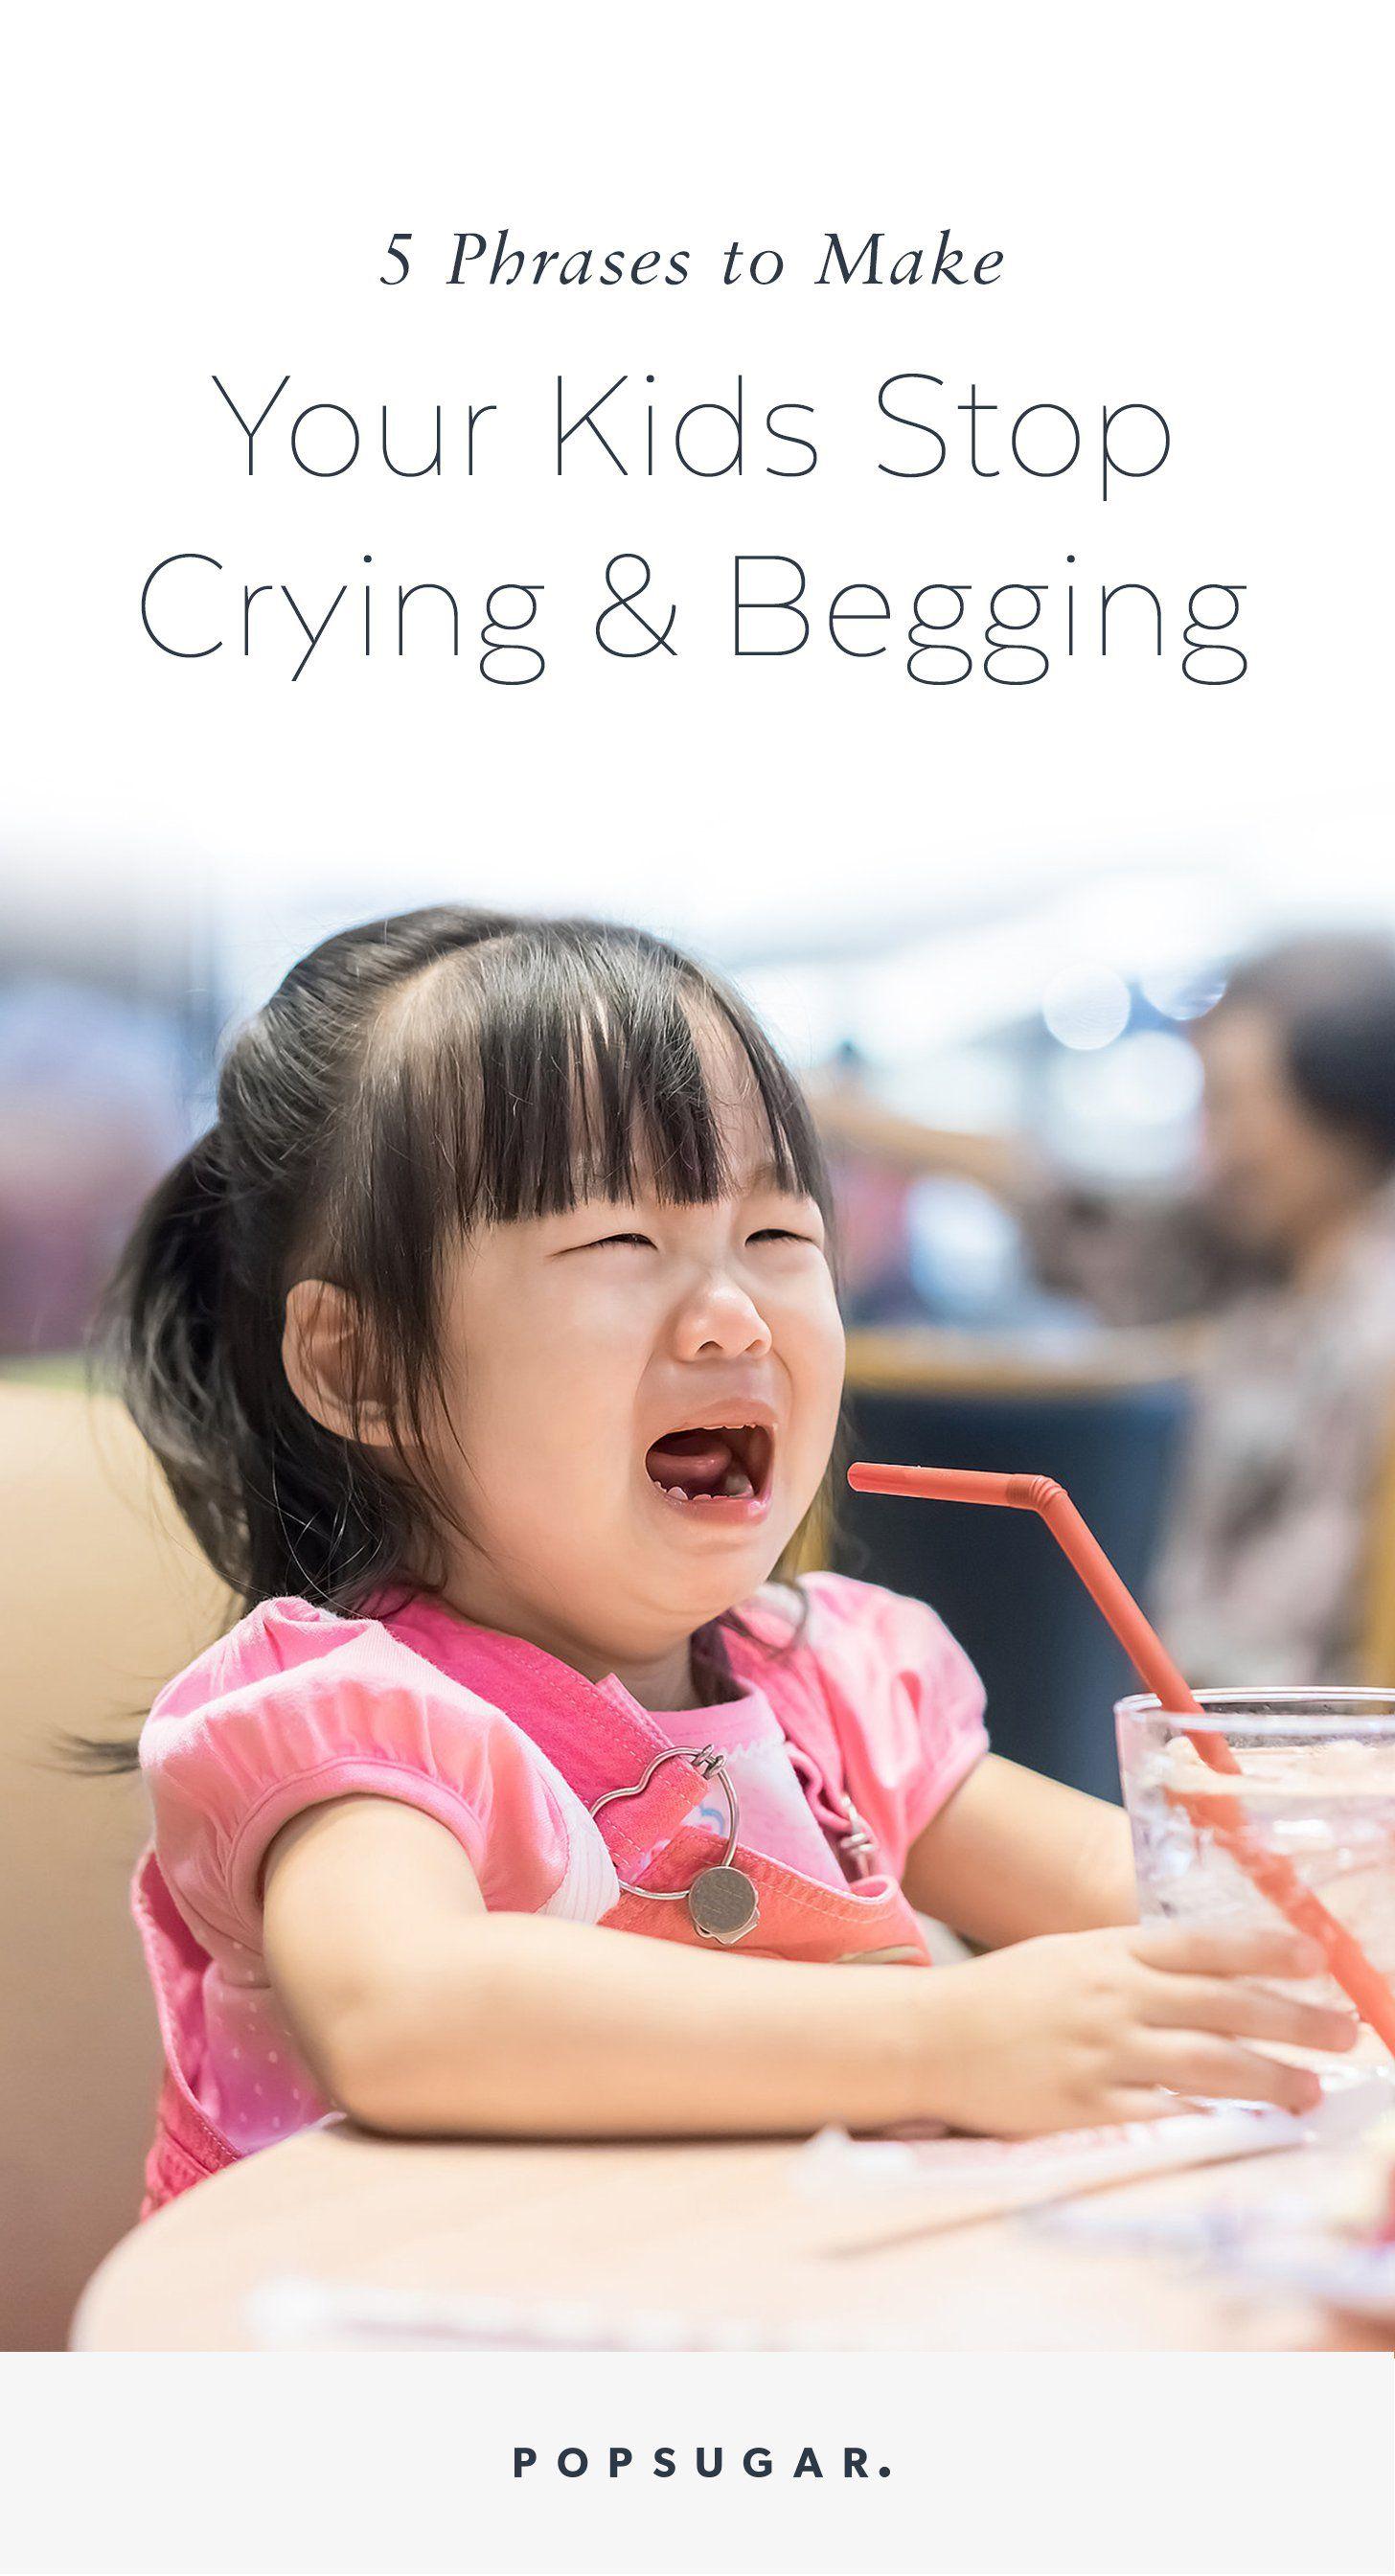 c189ea2c2f527834c819648b79330777 - How To Get A 1 Year Old To Stop Crying